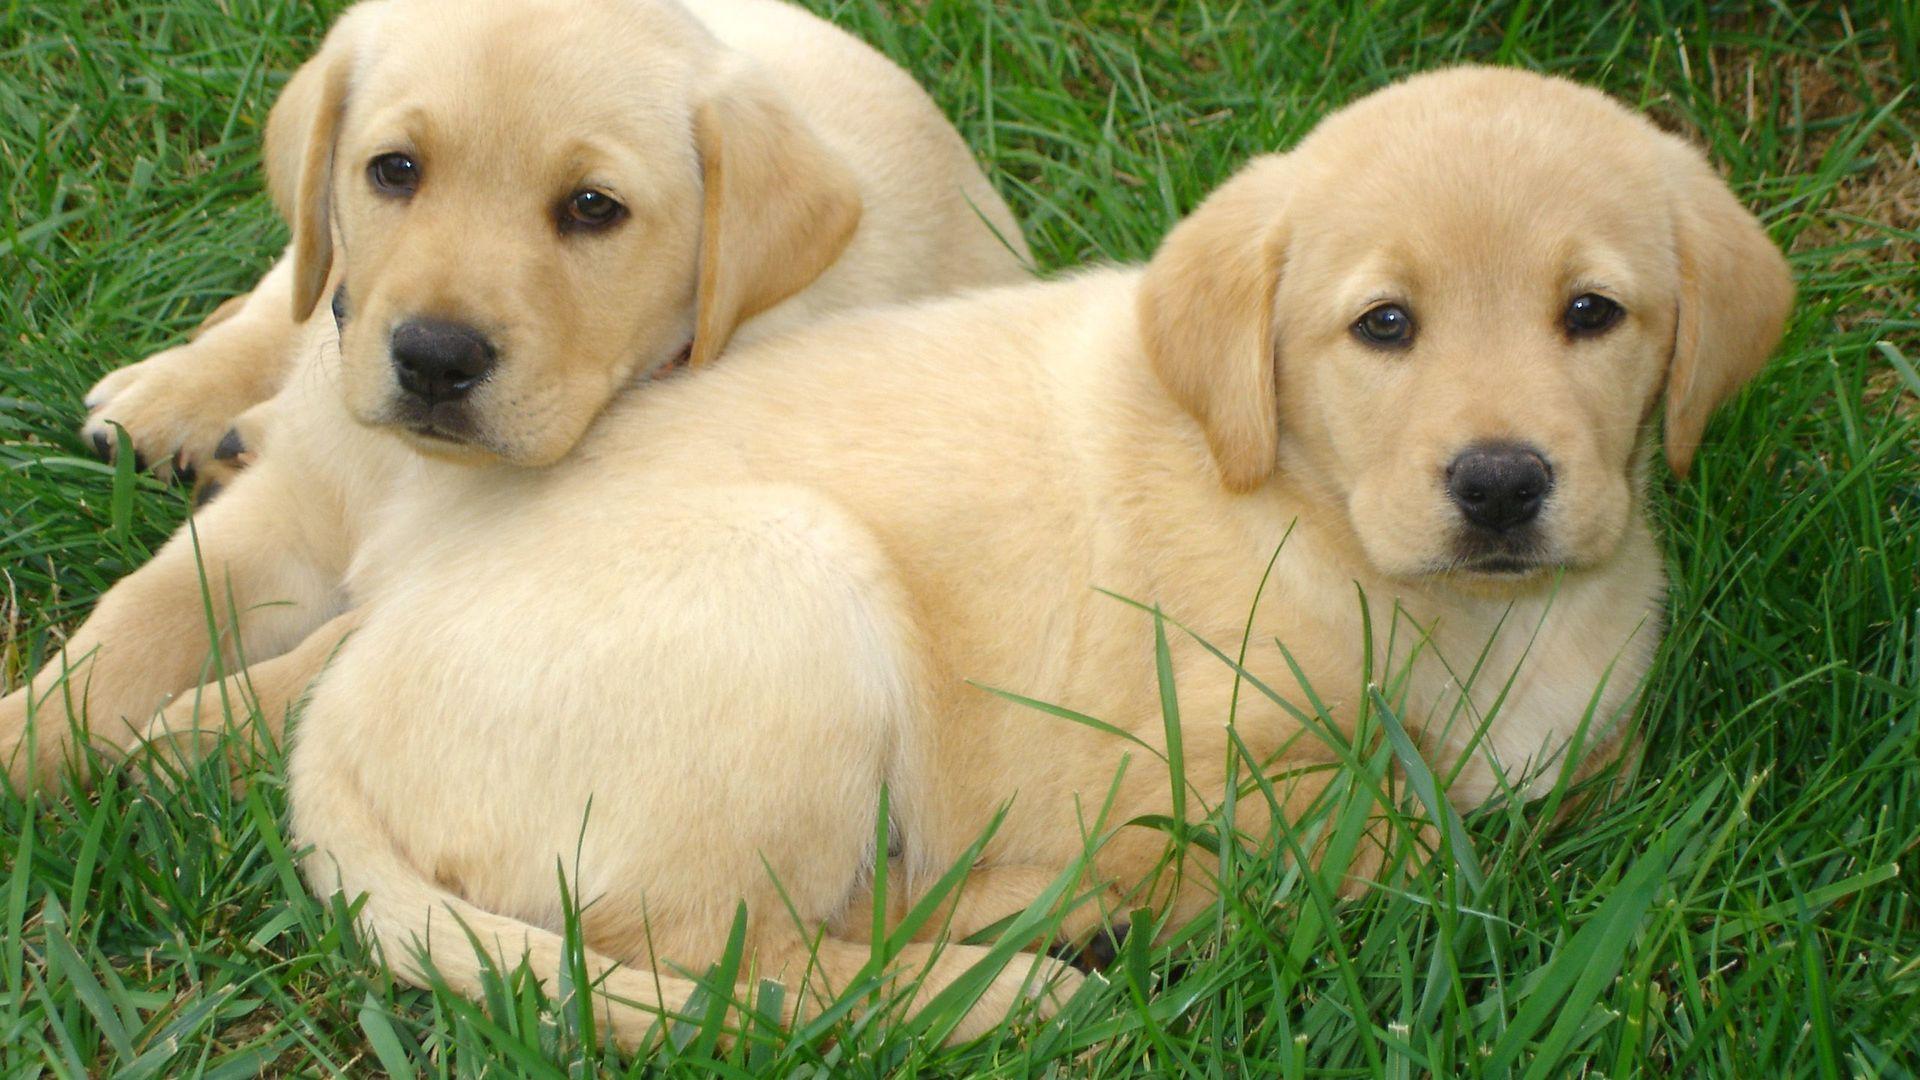 Labrador retriever puppies free hd wallpapers